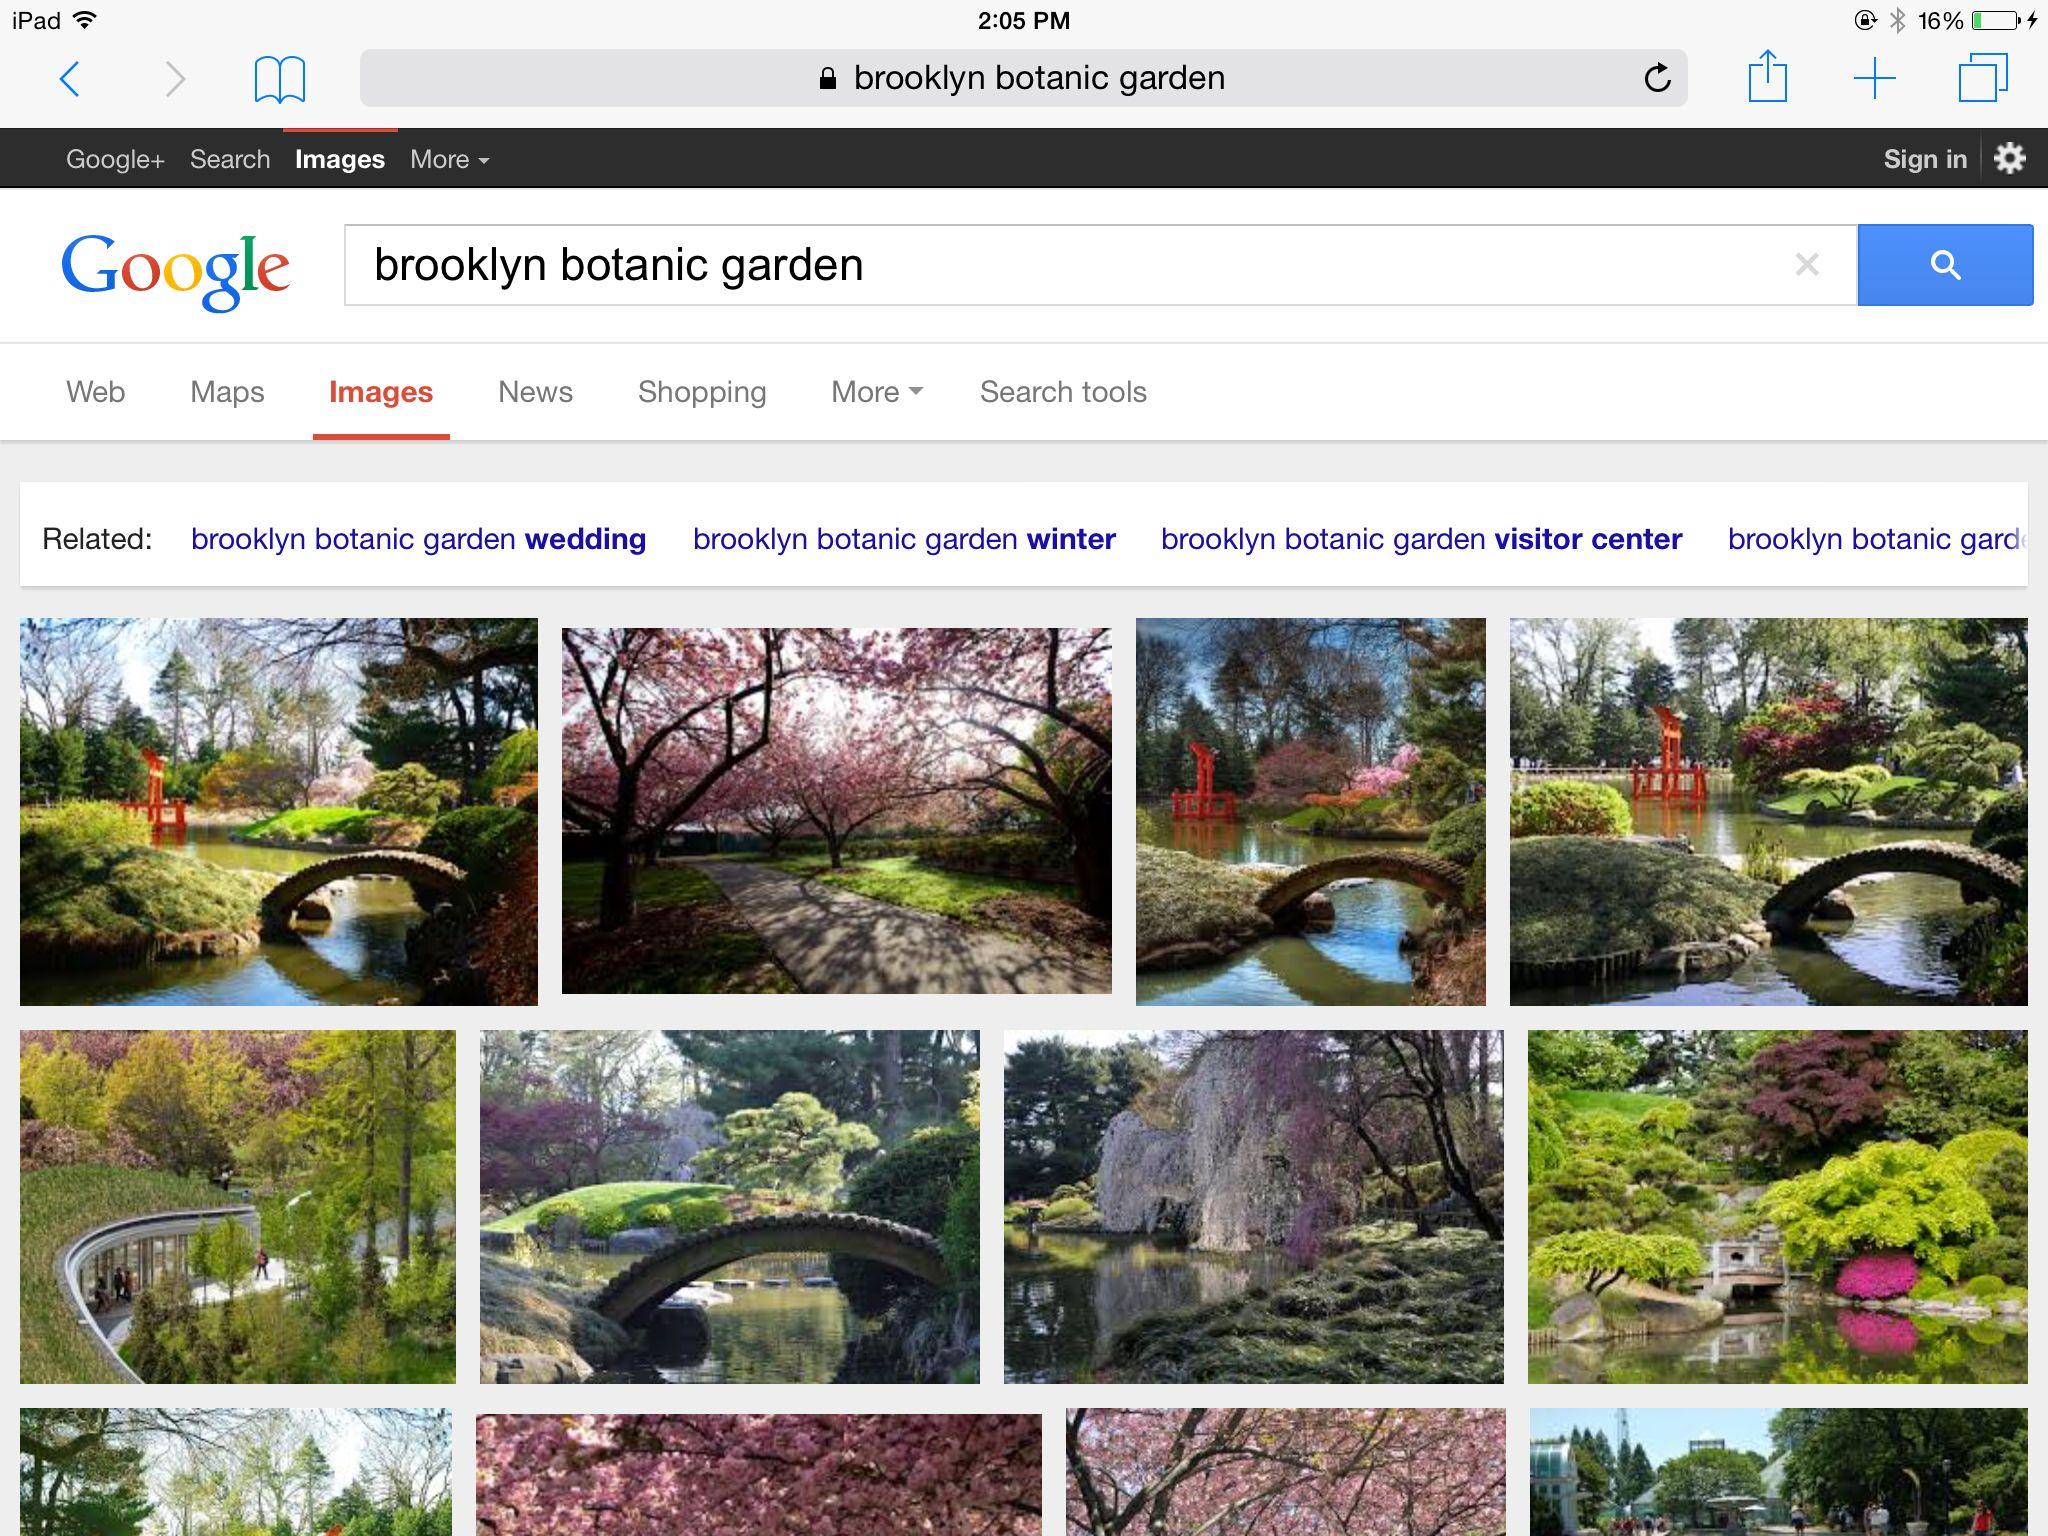 Brooklyn botanic garden Garden web, Botanical gardens